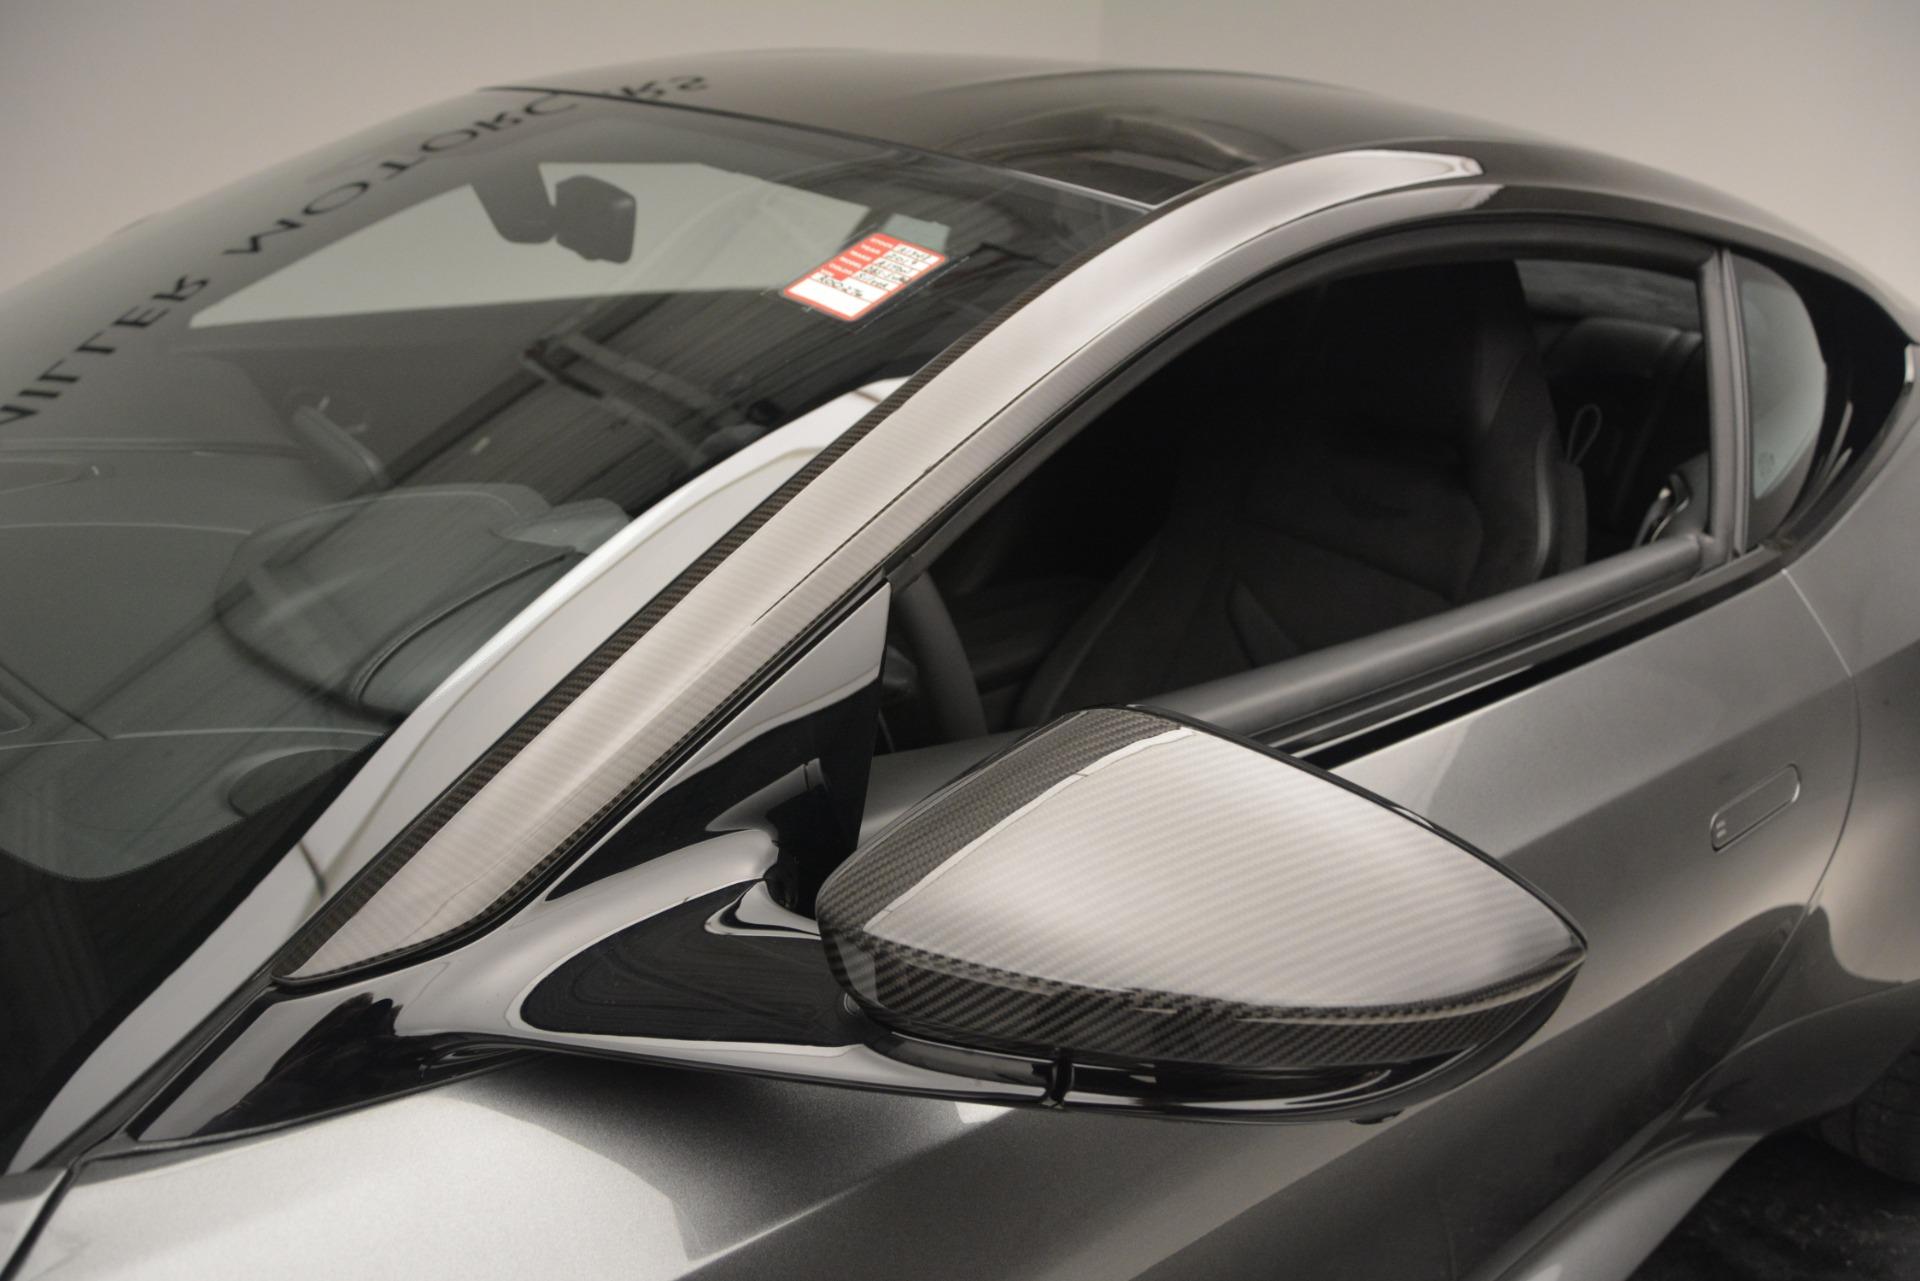 Used 2019 Aston Martin DBS Superleggera Coupe For Sale In Greenwich, CT 2917_p22